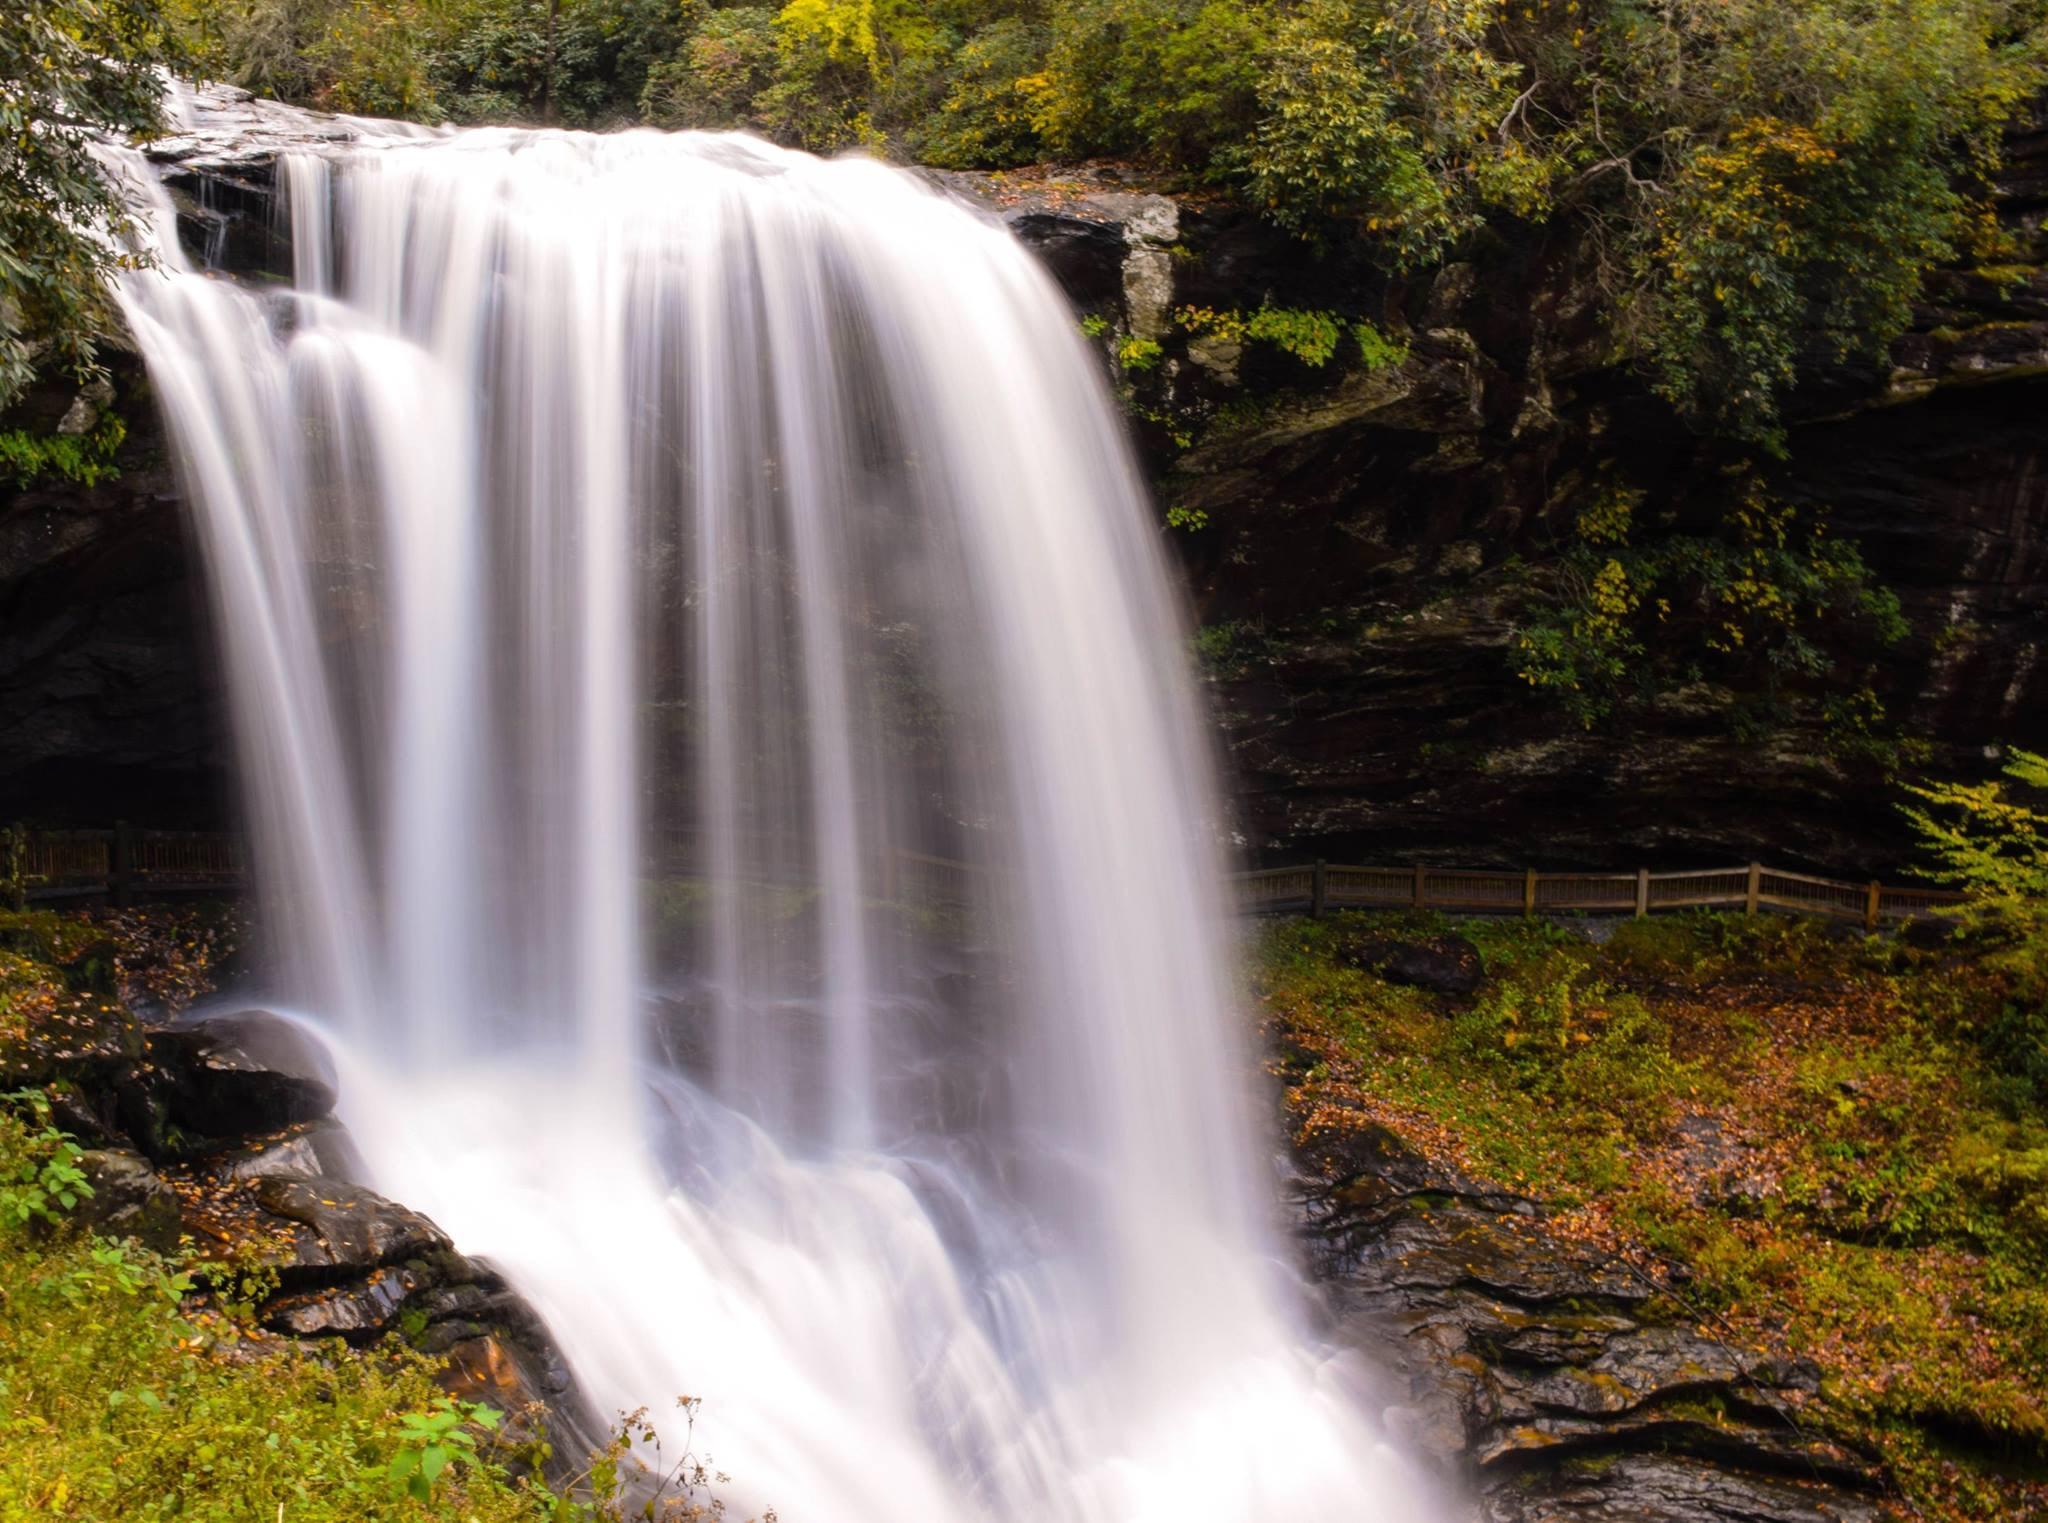 low exposure photo of waterfall